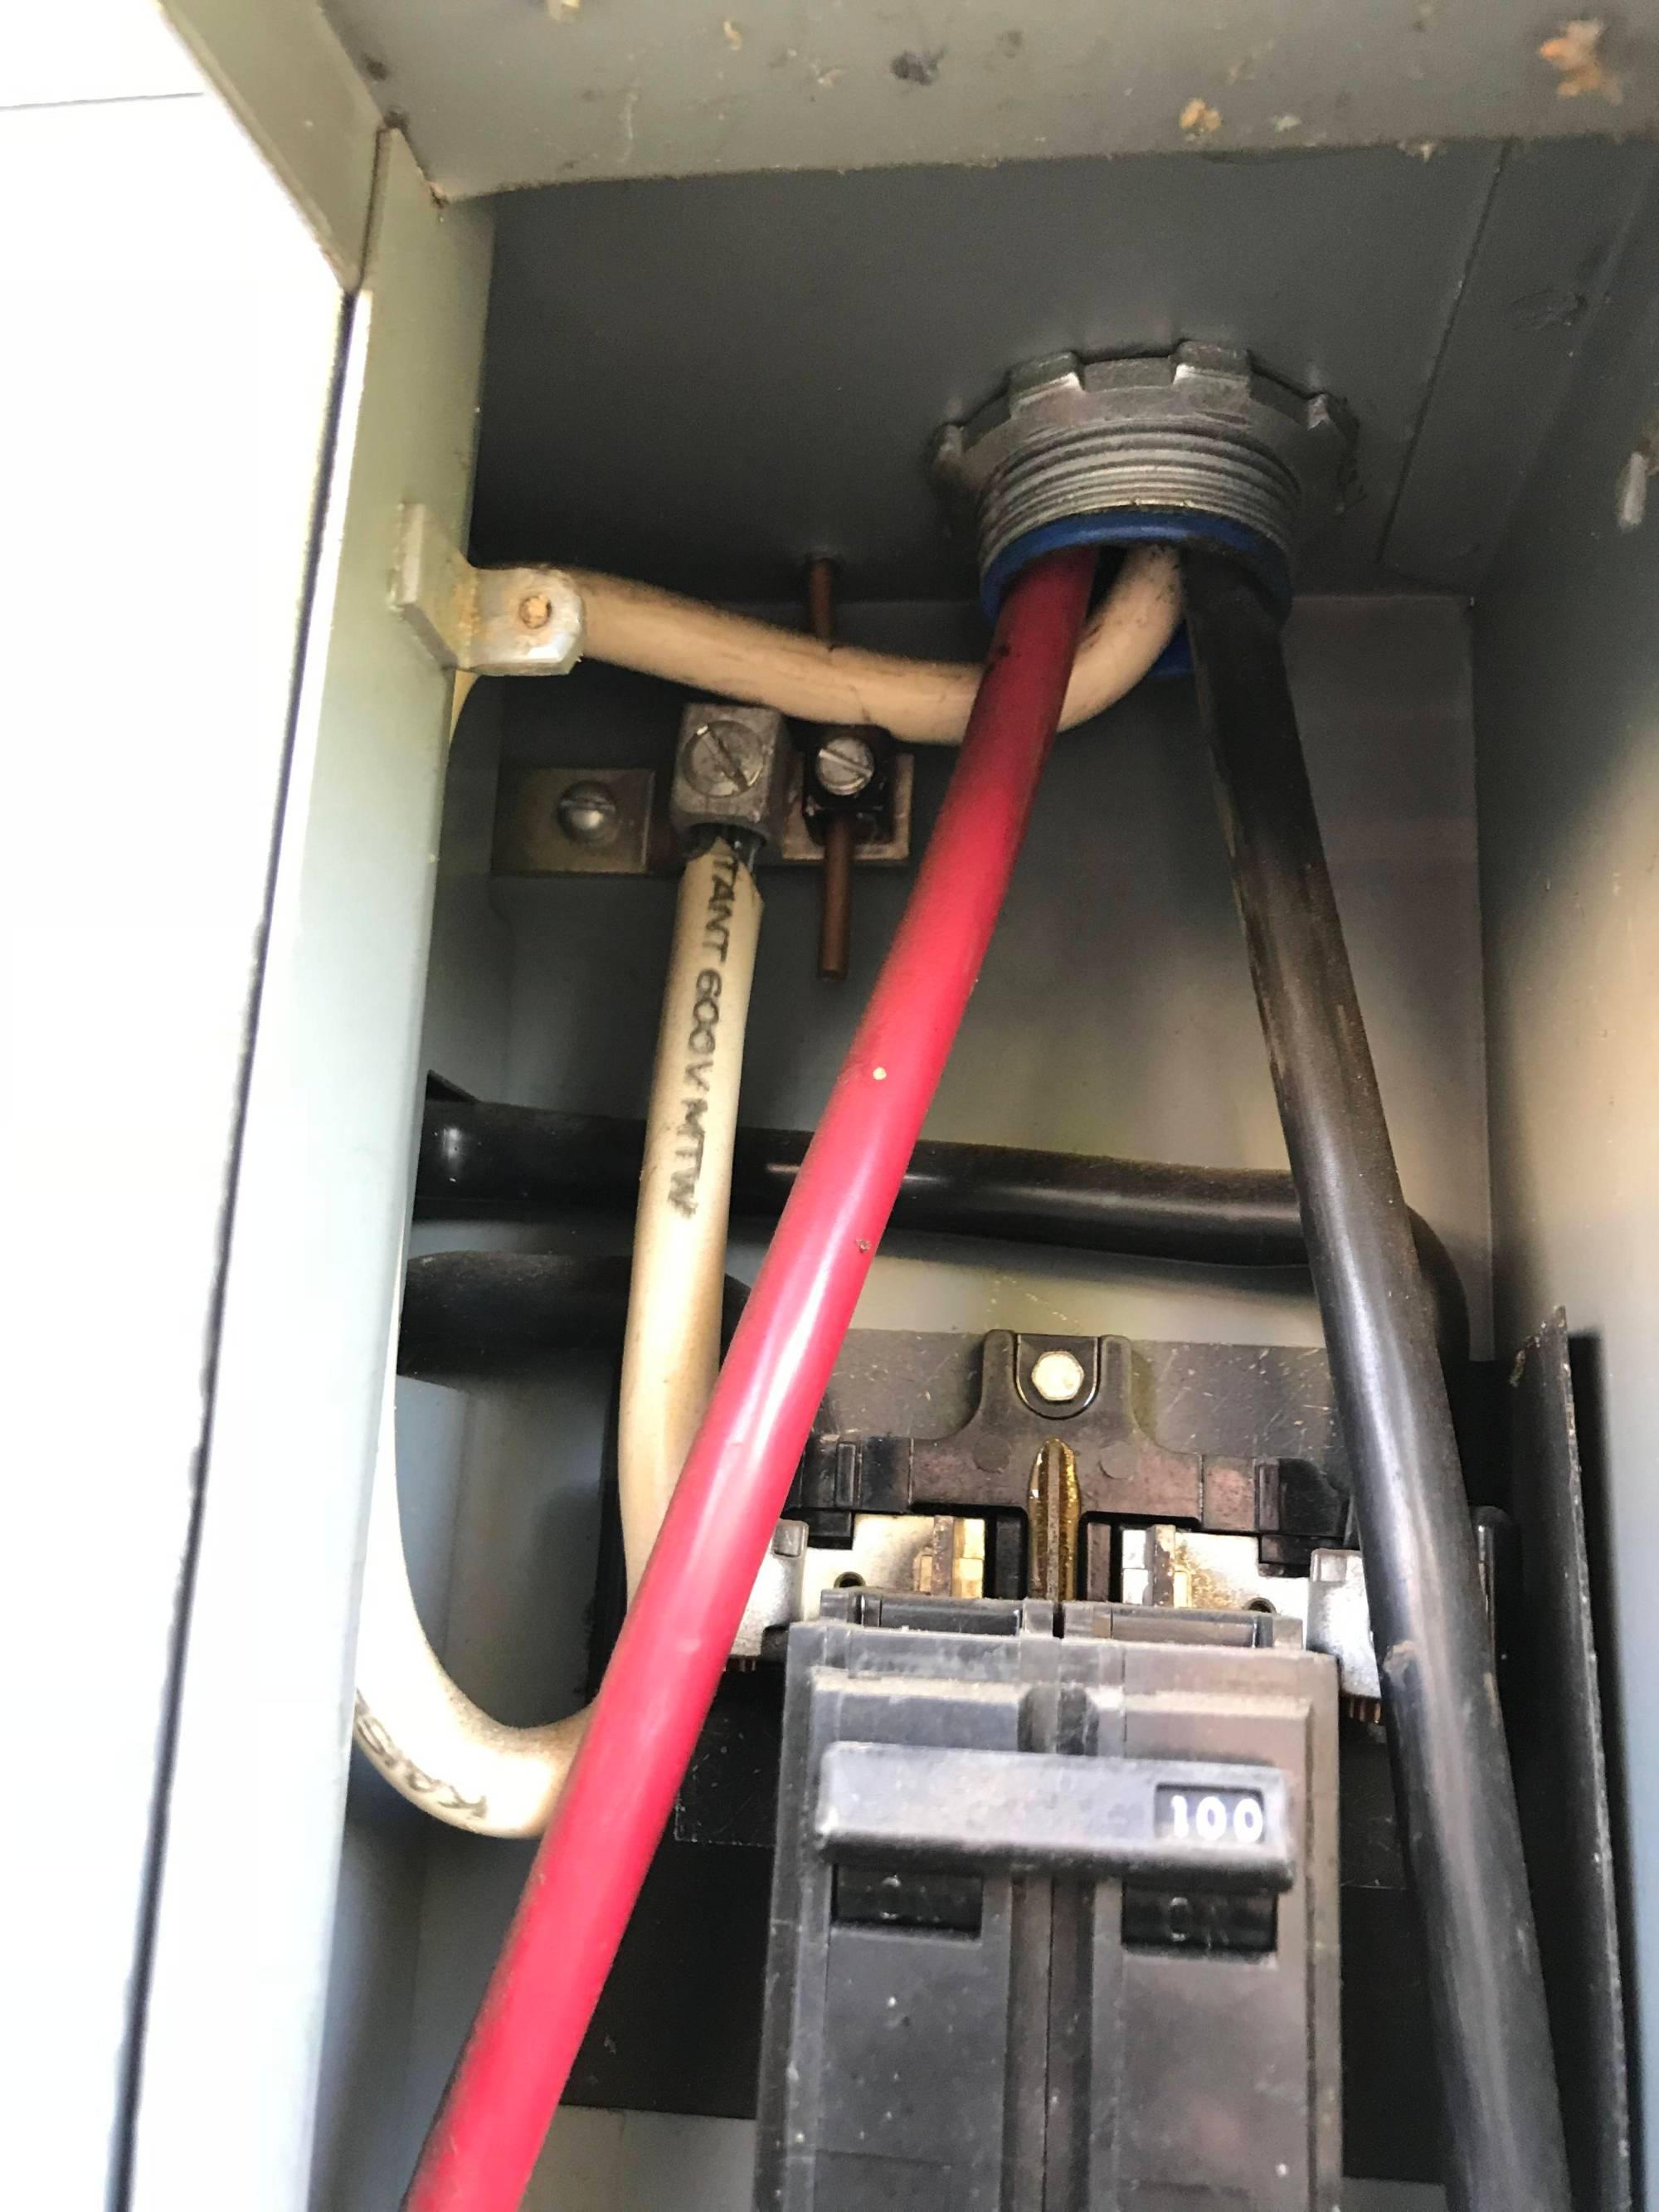 hight resolution of enter image description here enter image description here electrical wiring ground